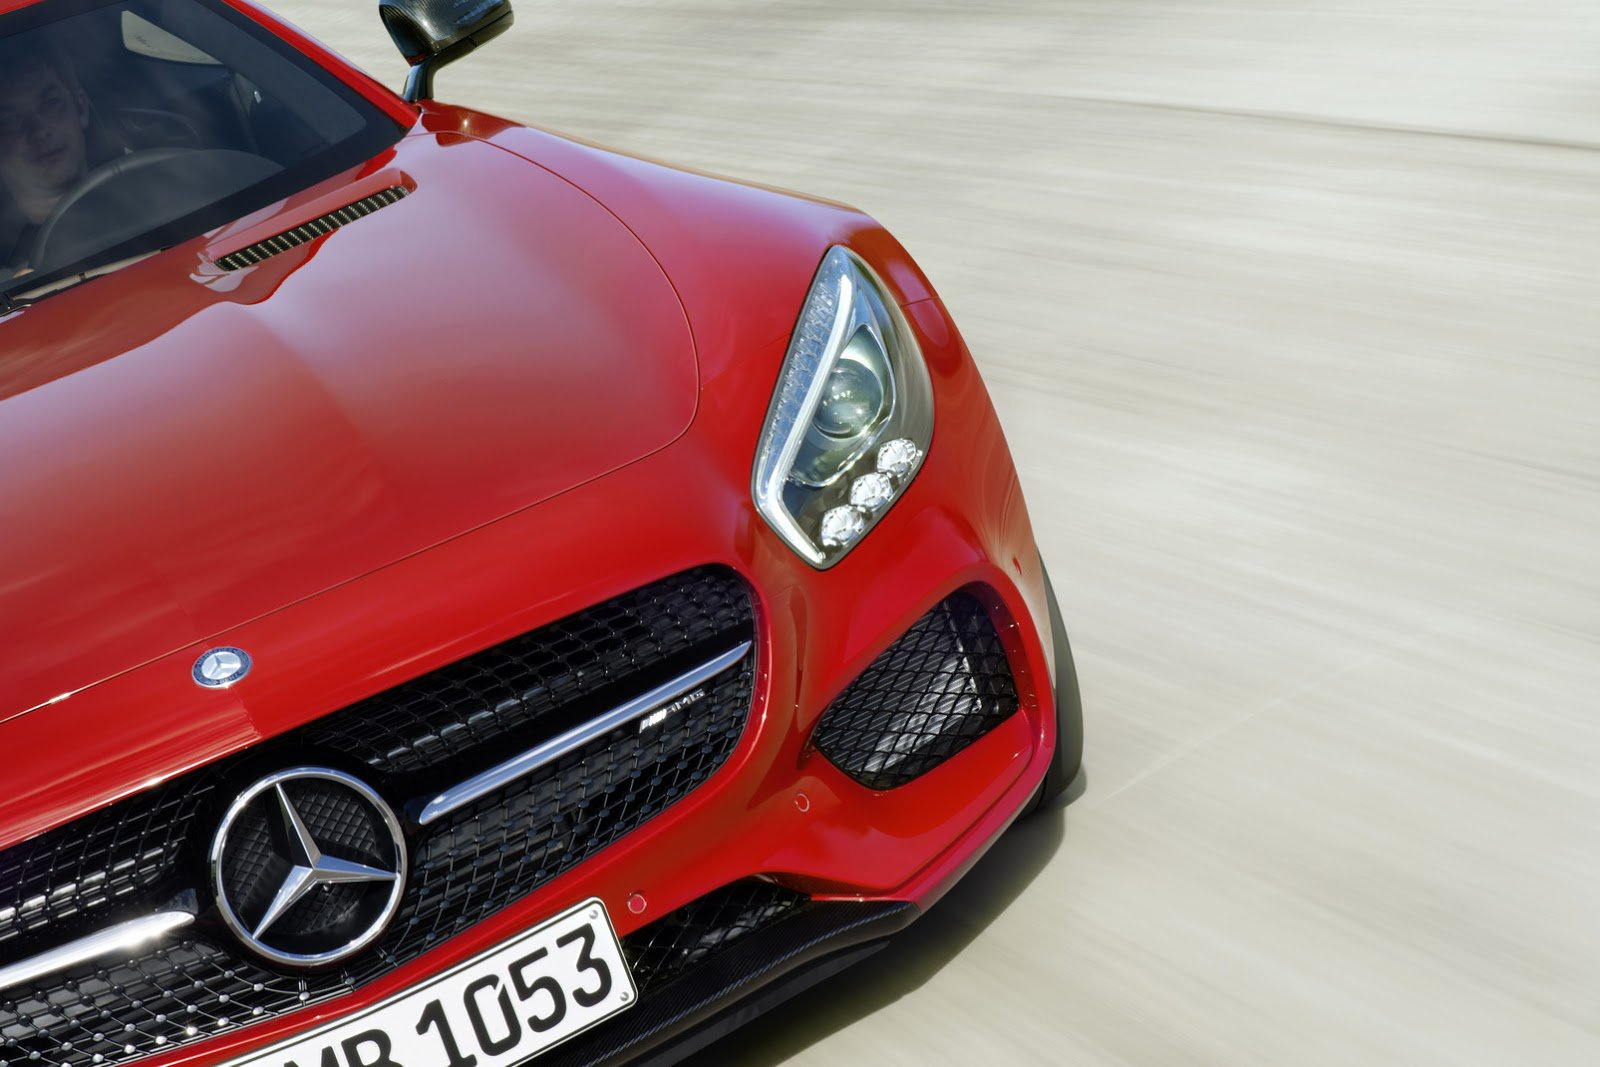 Mercedes AMG GT Подробности, технические характеристики